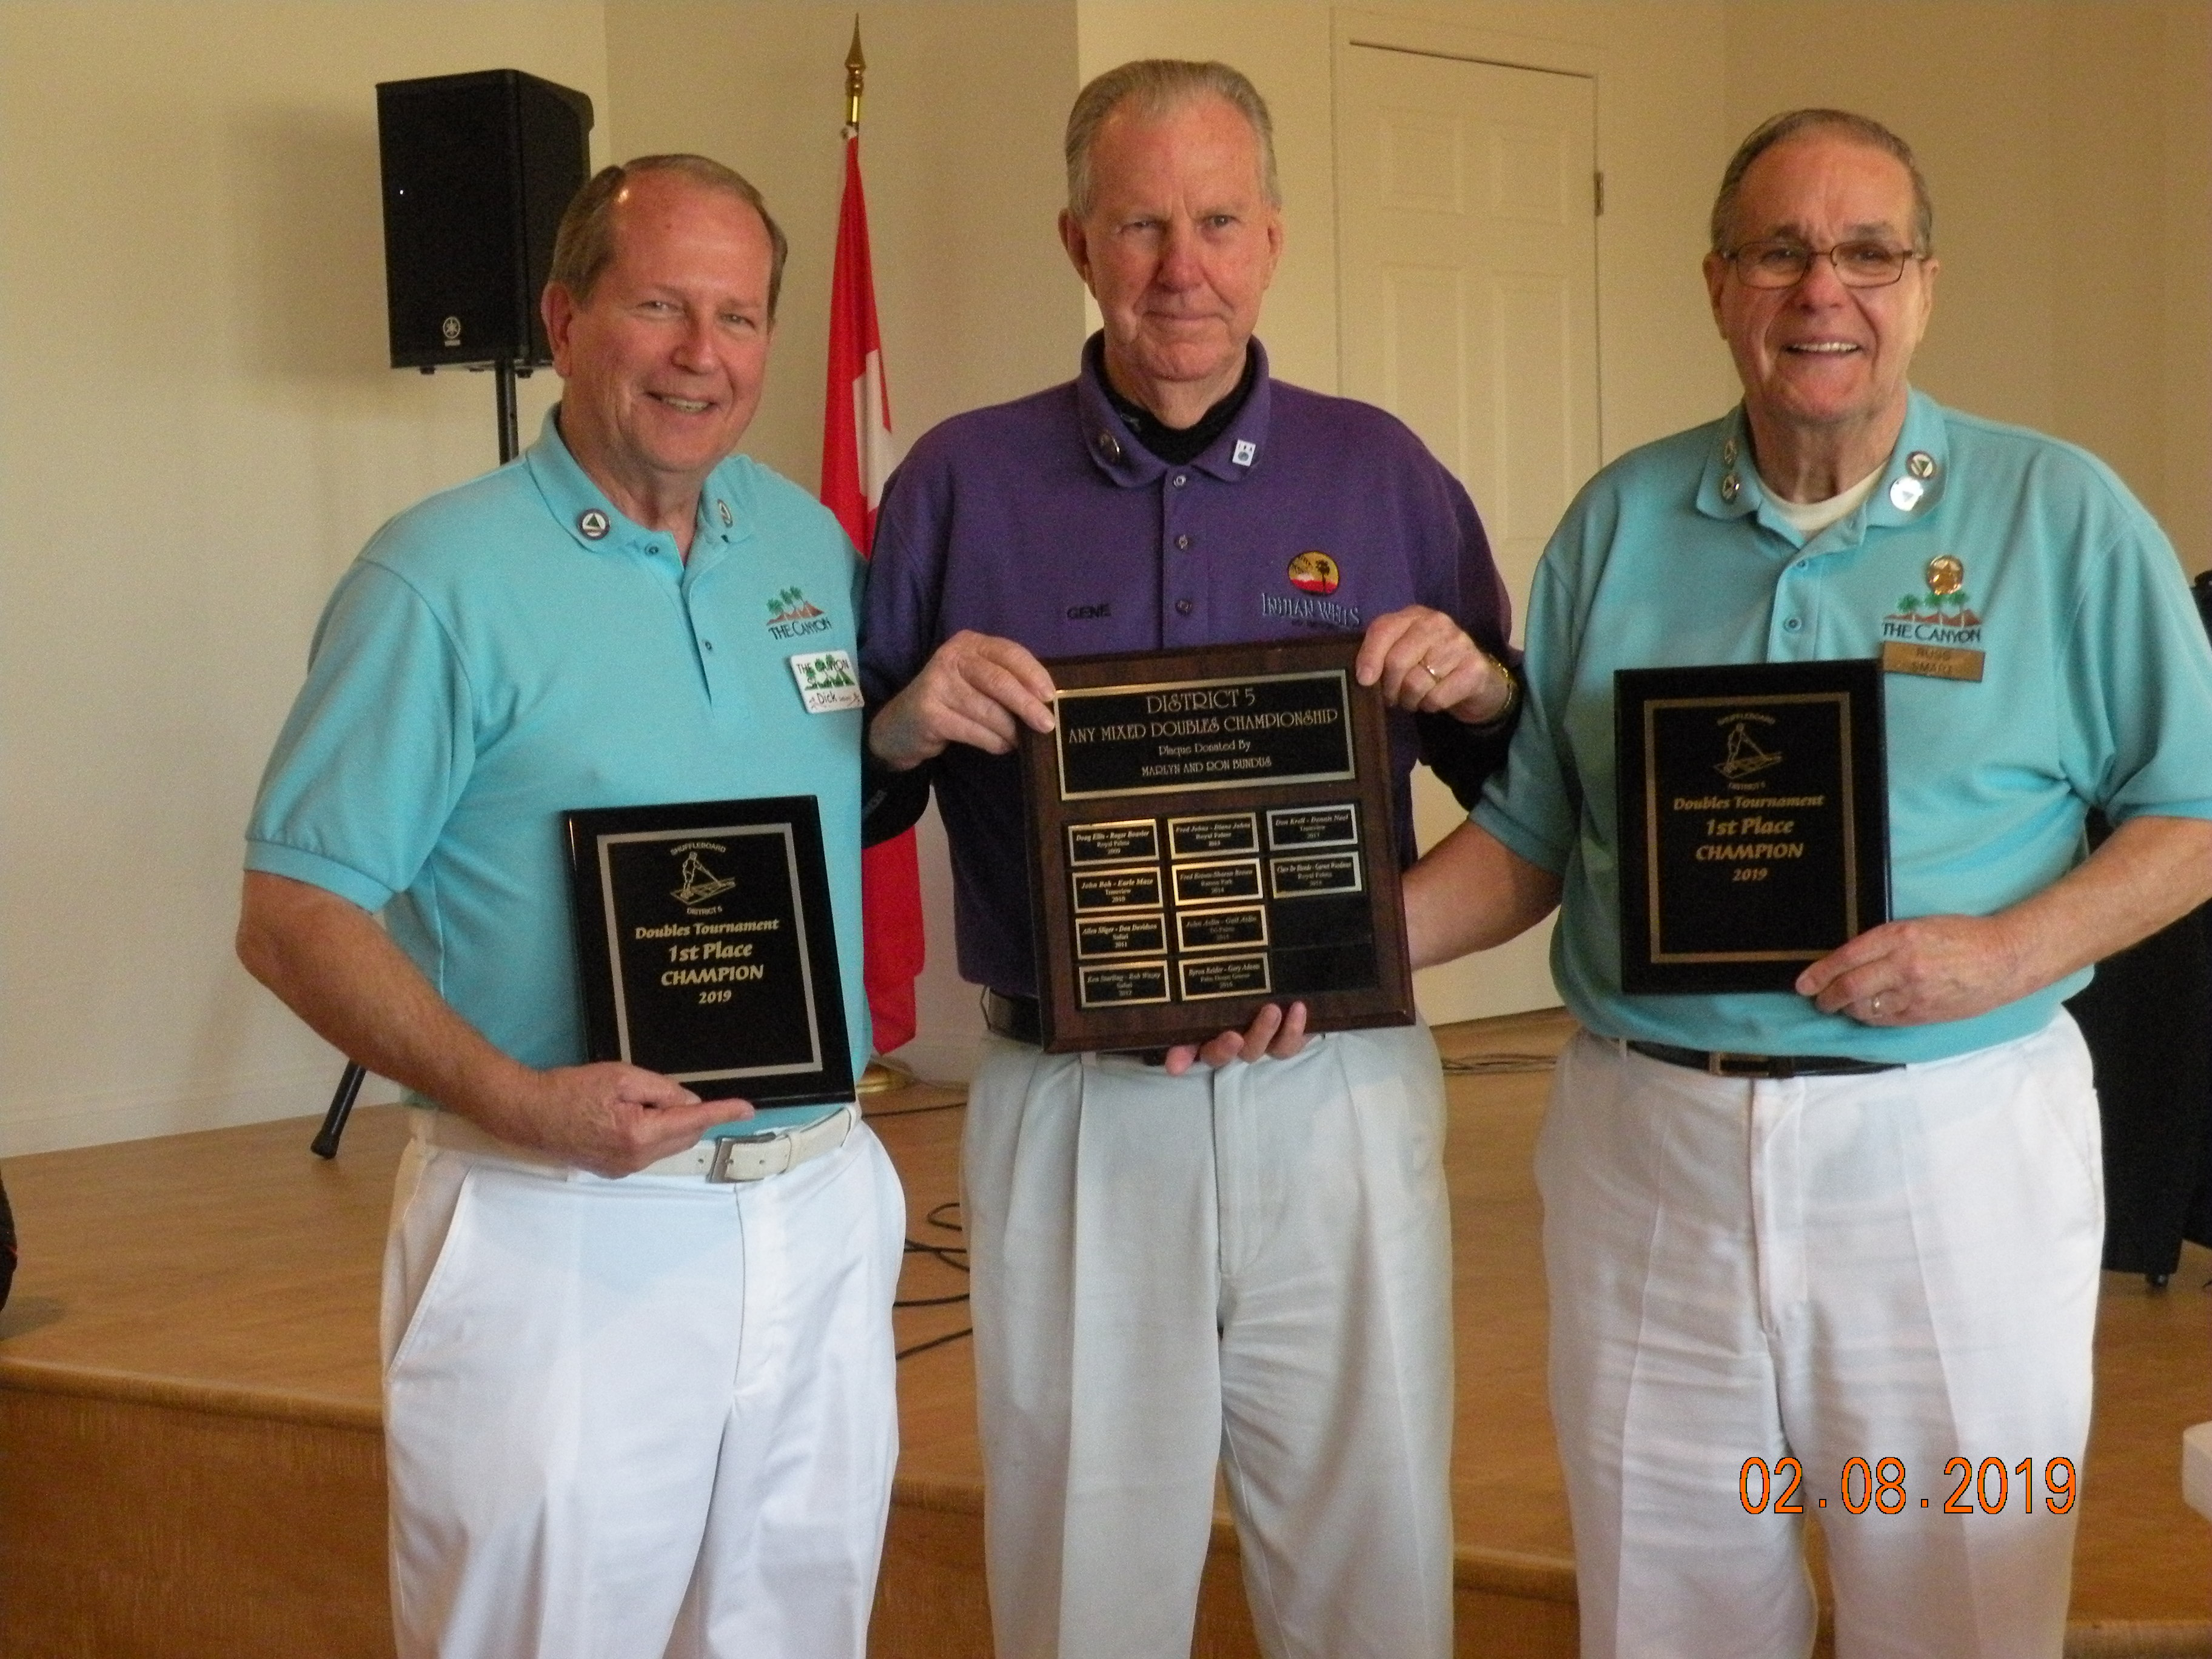 Dick Seburn & Russel Smart Champions.JPG